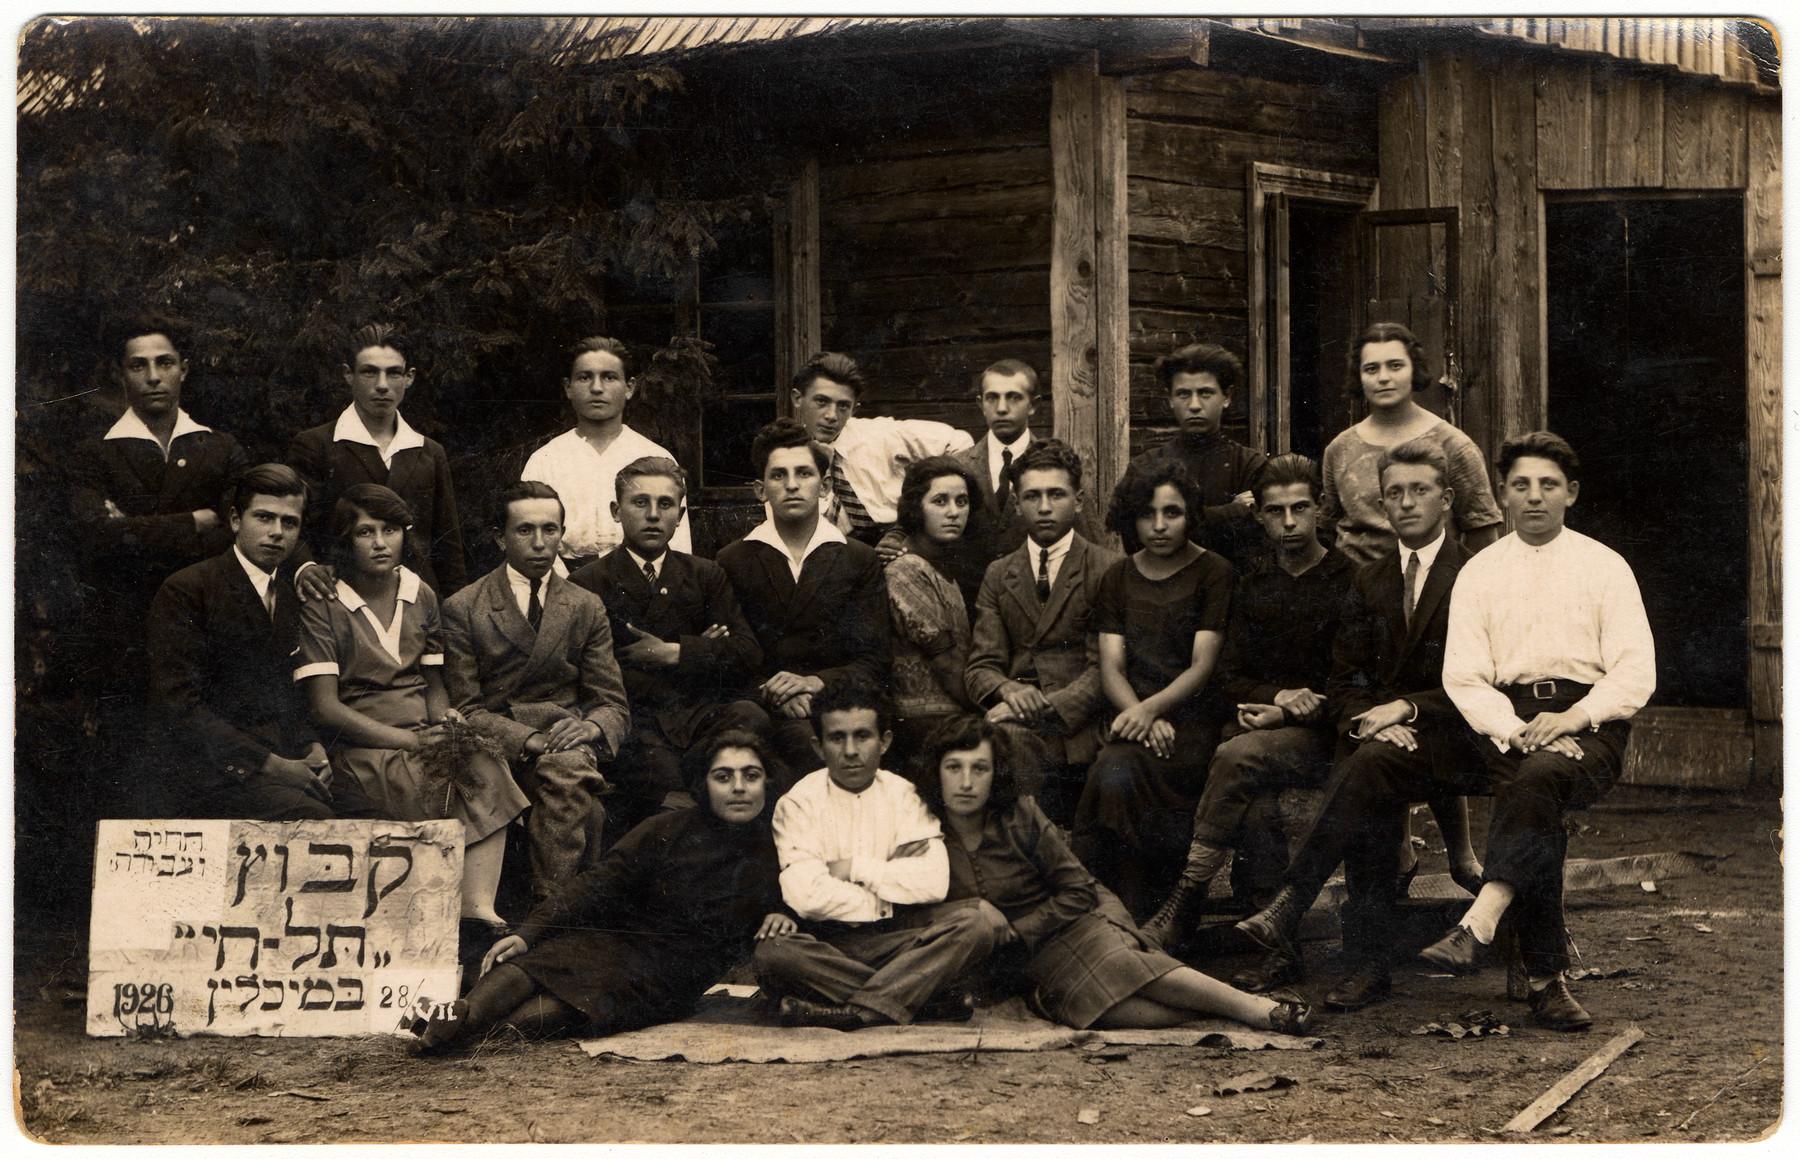 Members of the Zionist hachshara, Kibbutz Tel-Chai in Michalin.